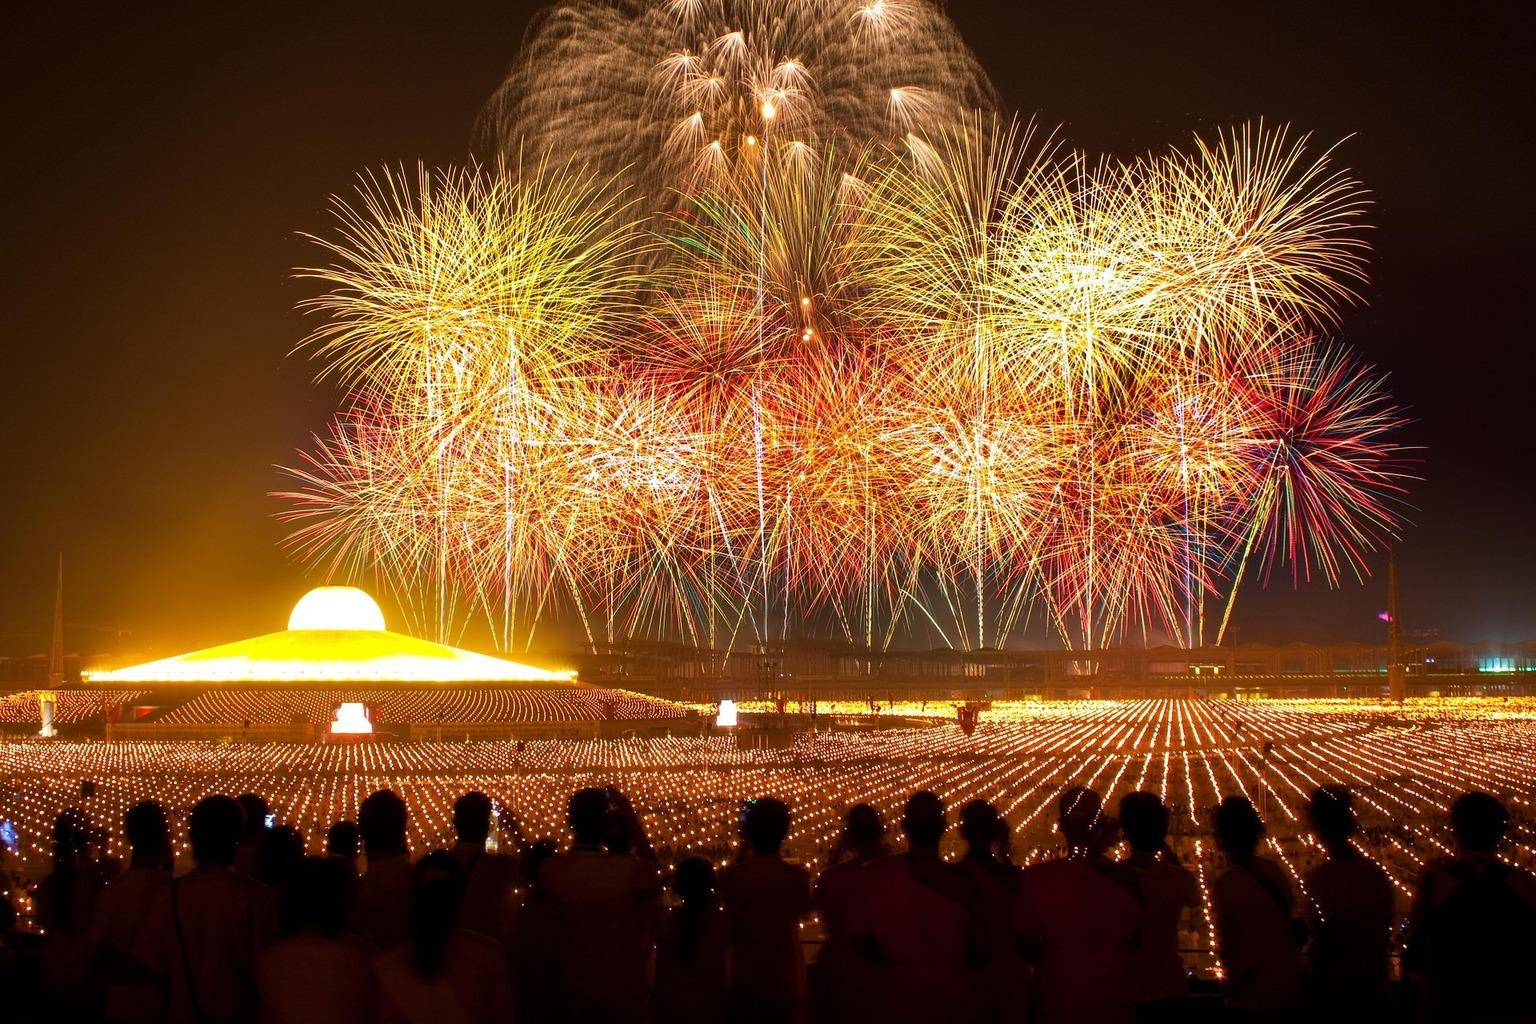 Oslavy ve Wat Phra Dhammakaya